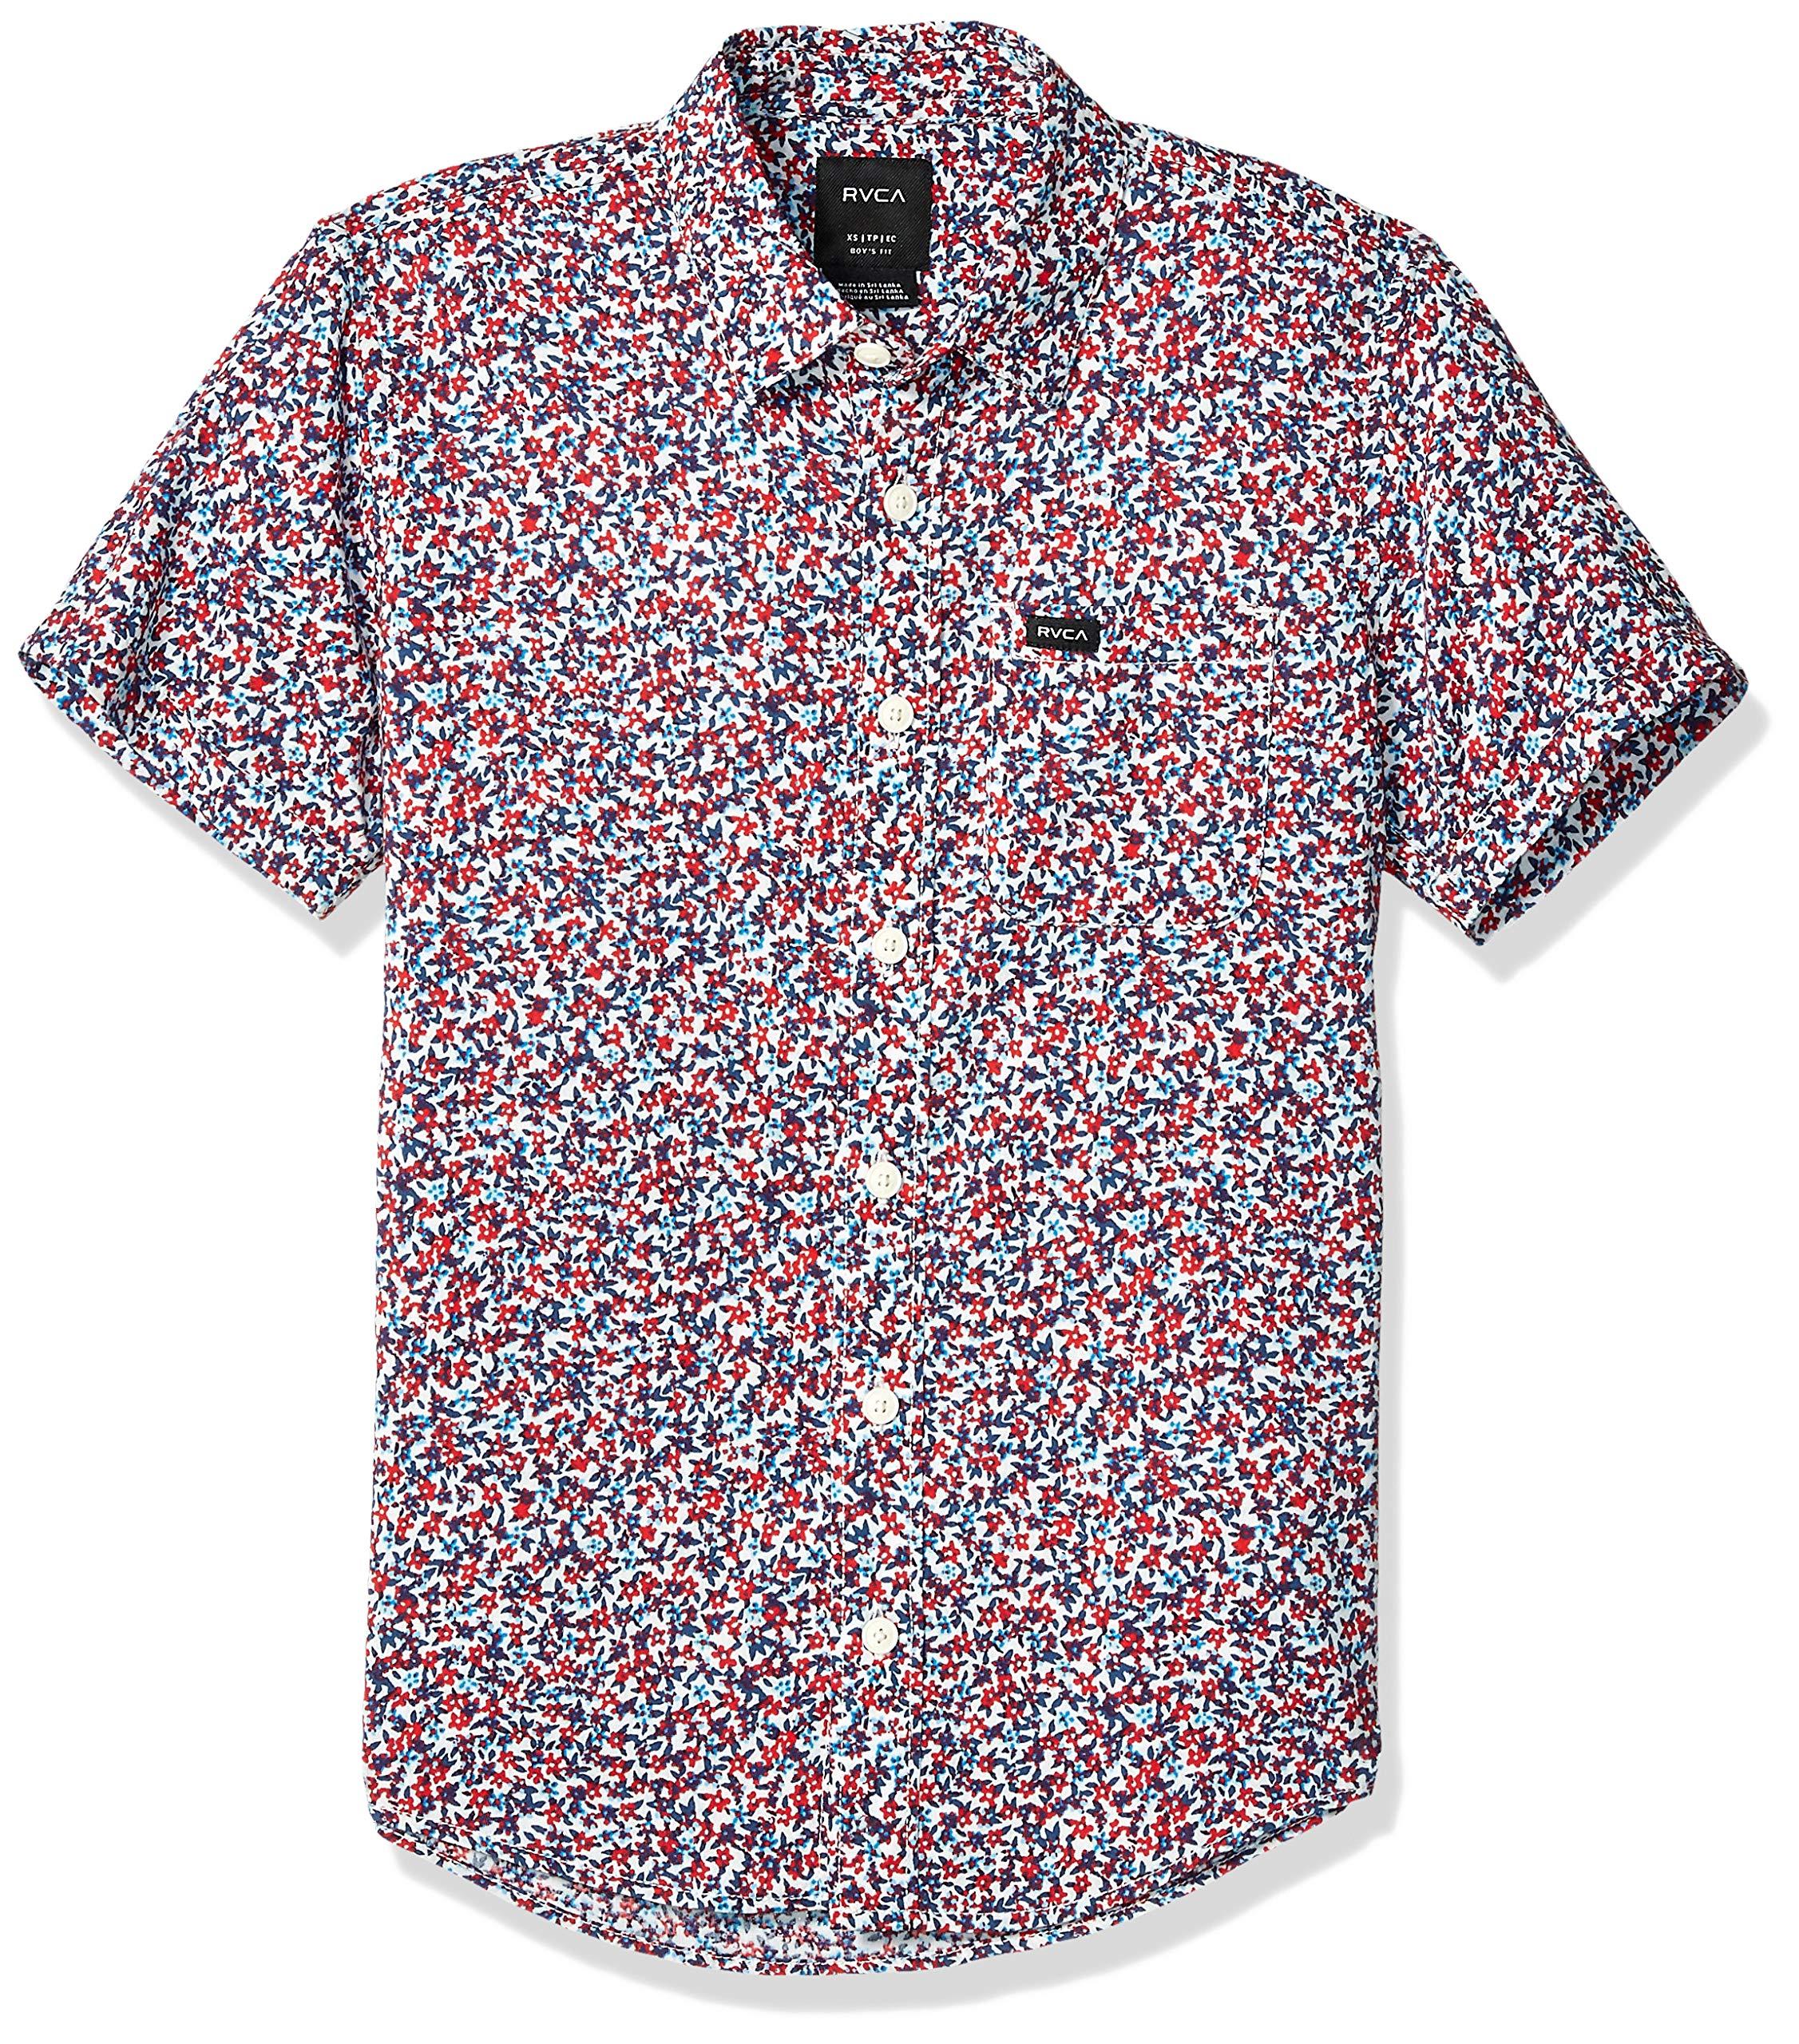 RVCA Boys' Big Revivalist Floral Short Sleeve Woven Button UP Shirt, Antique/White, M